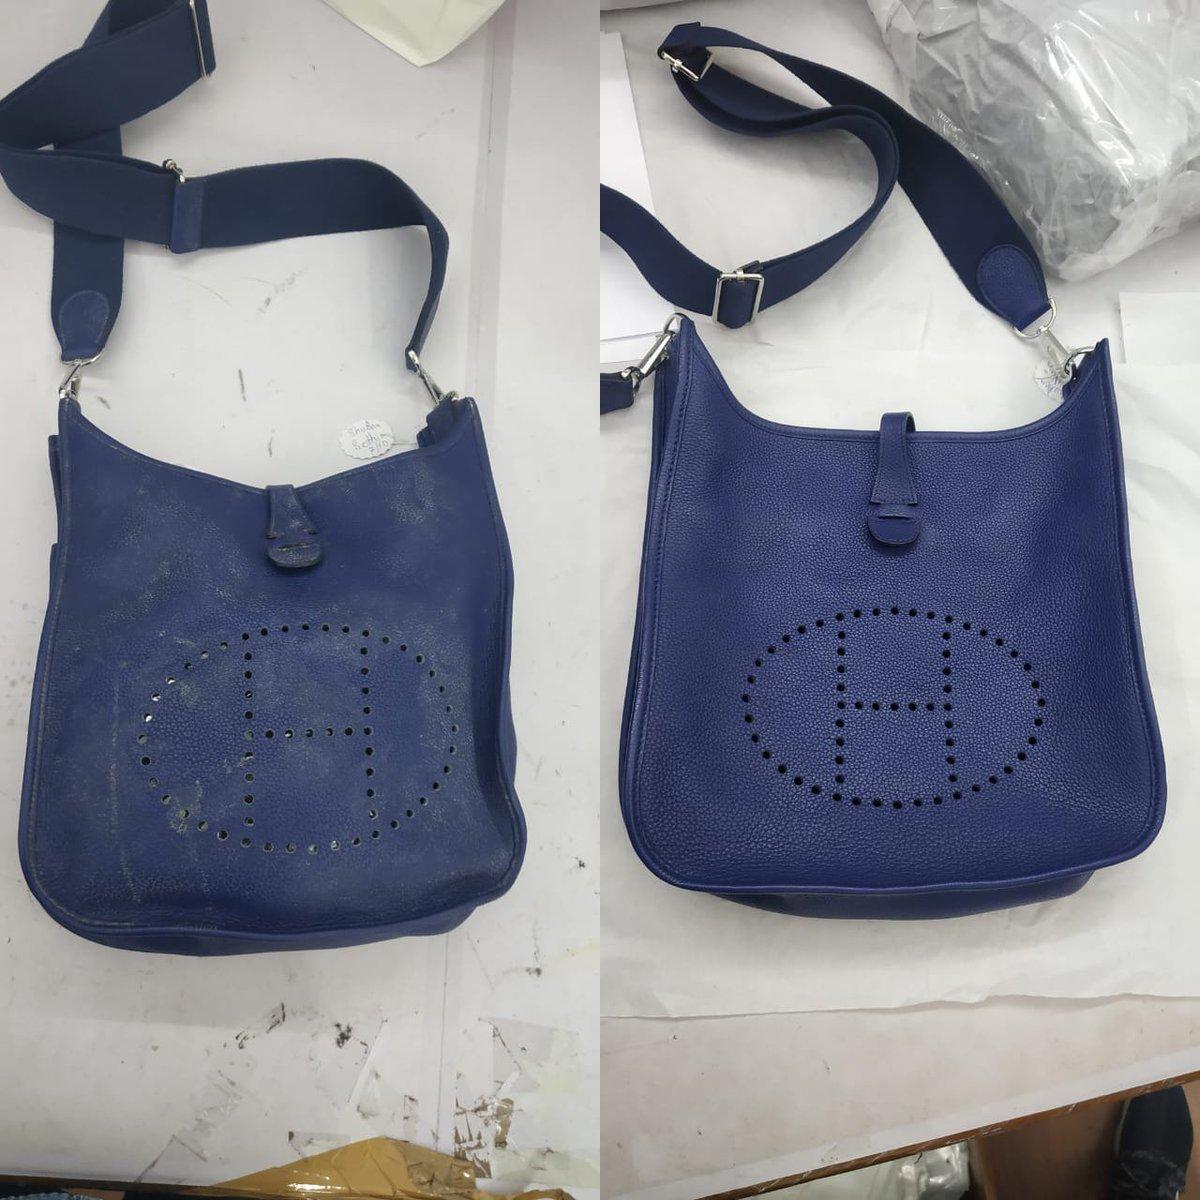 Hermes Evelyne Bag Dry Cleaning